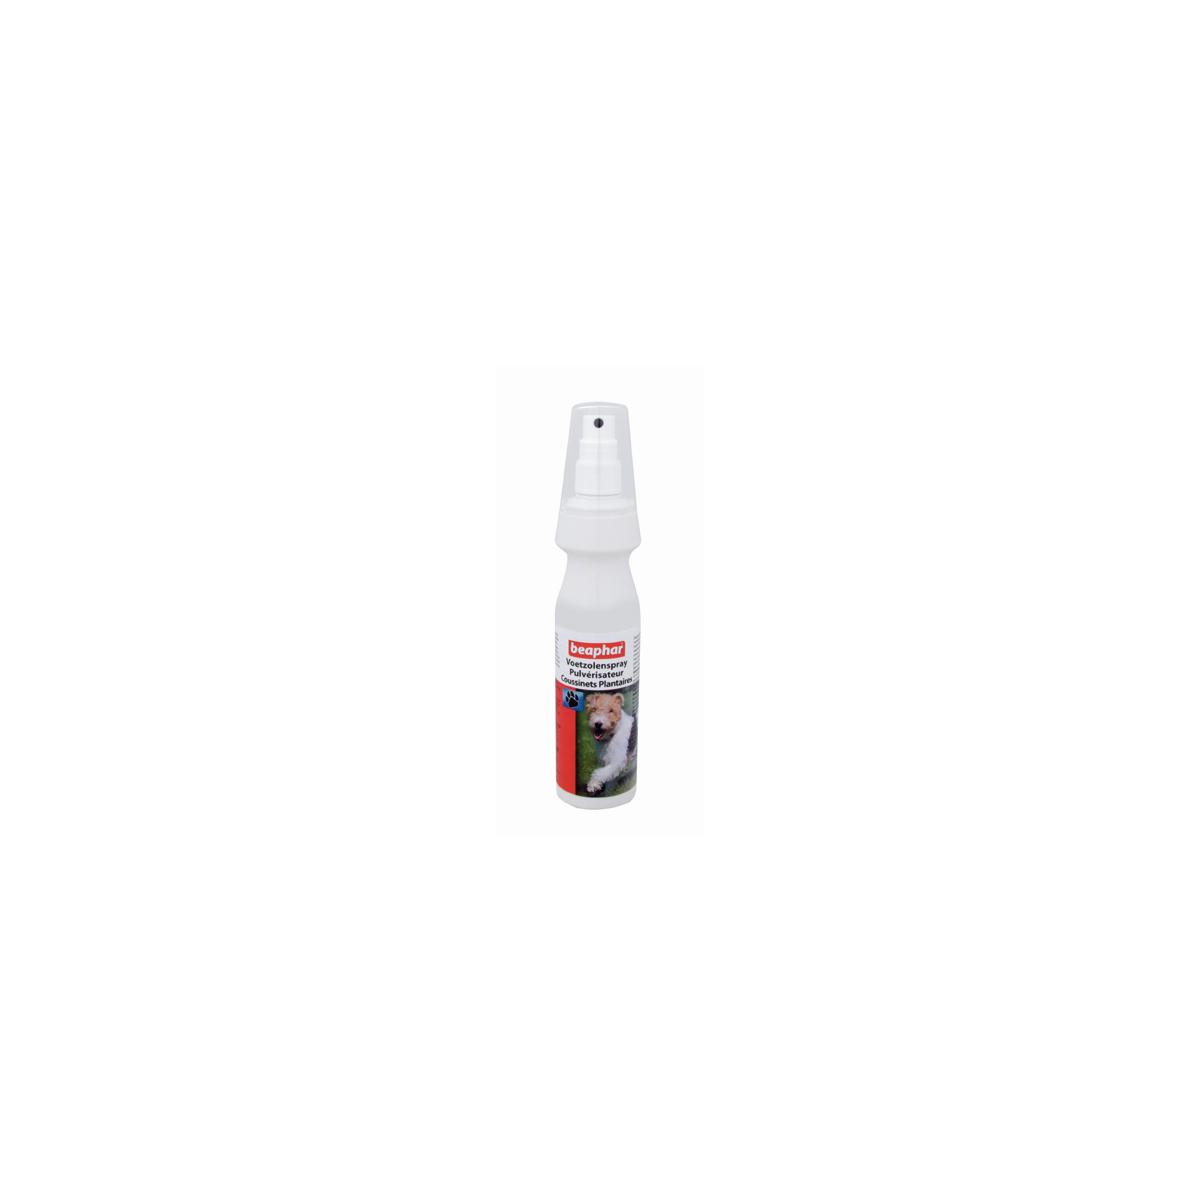 Voetzolenspray meerkleurig 150 ml